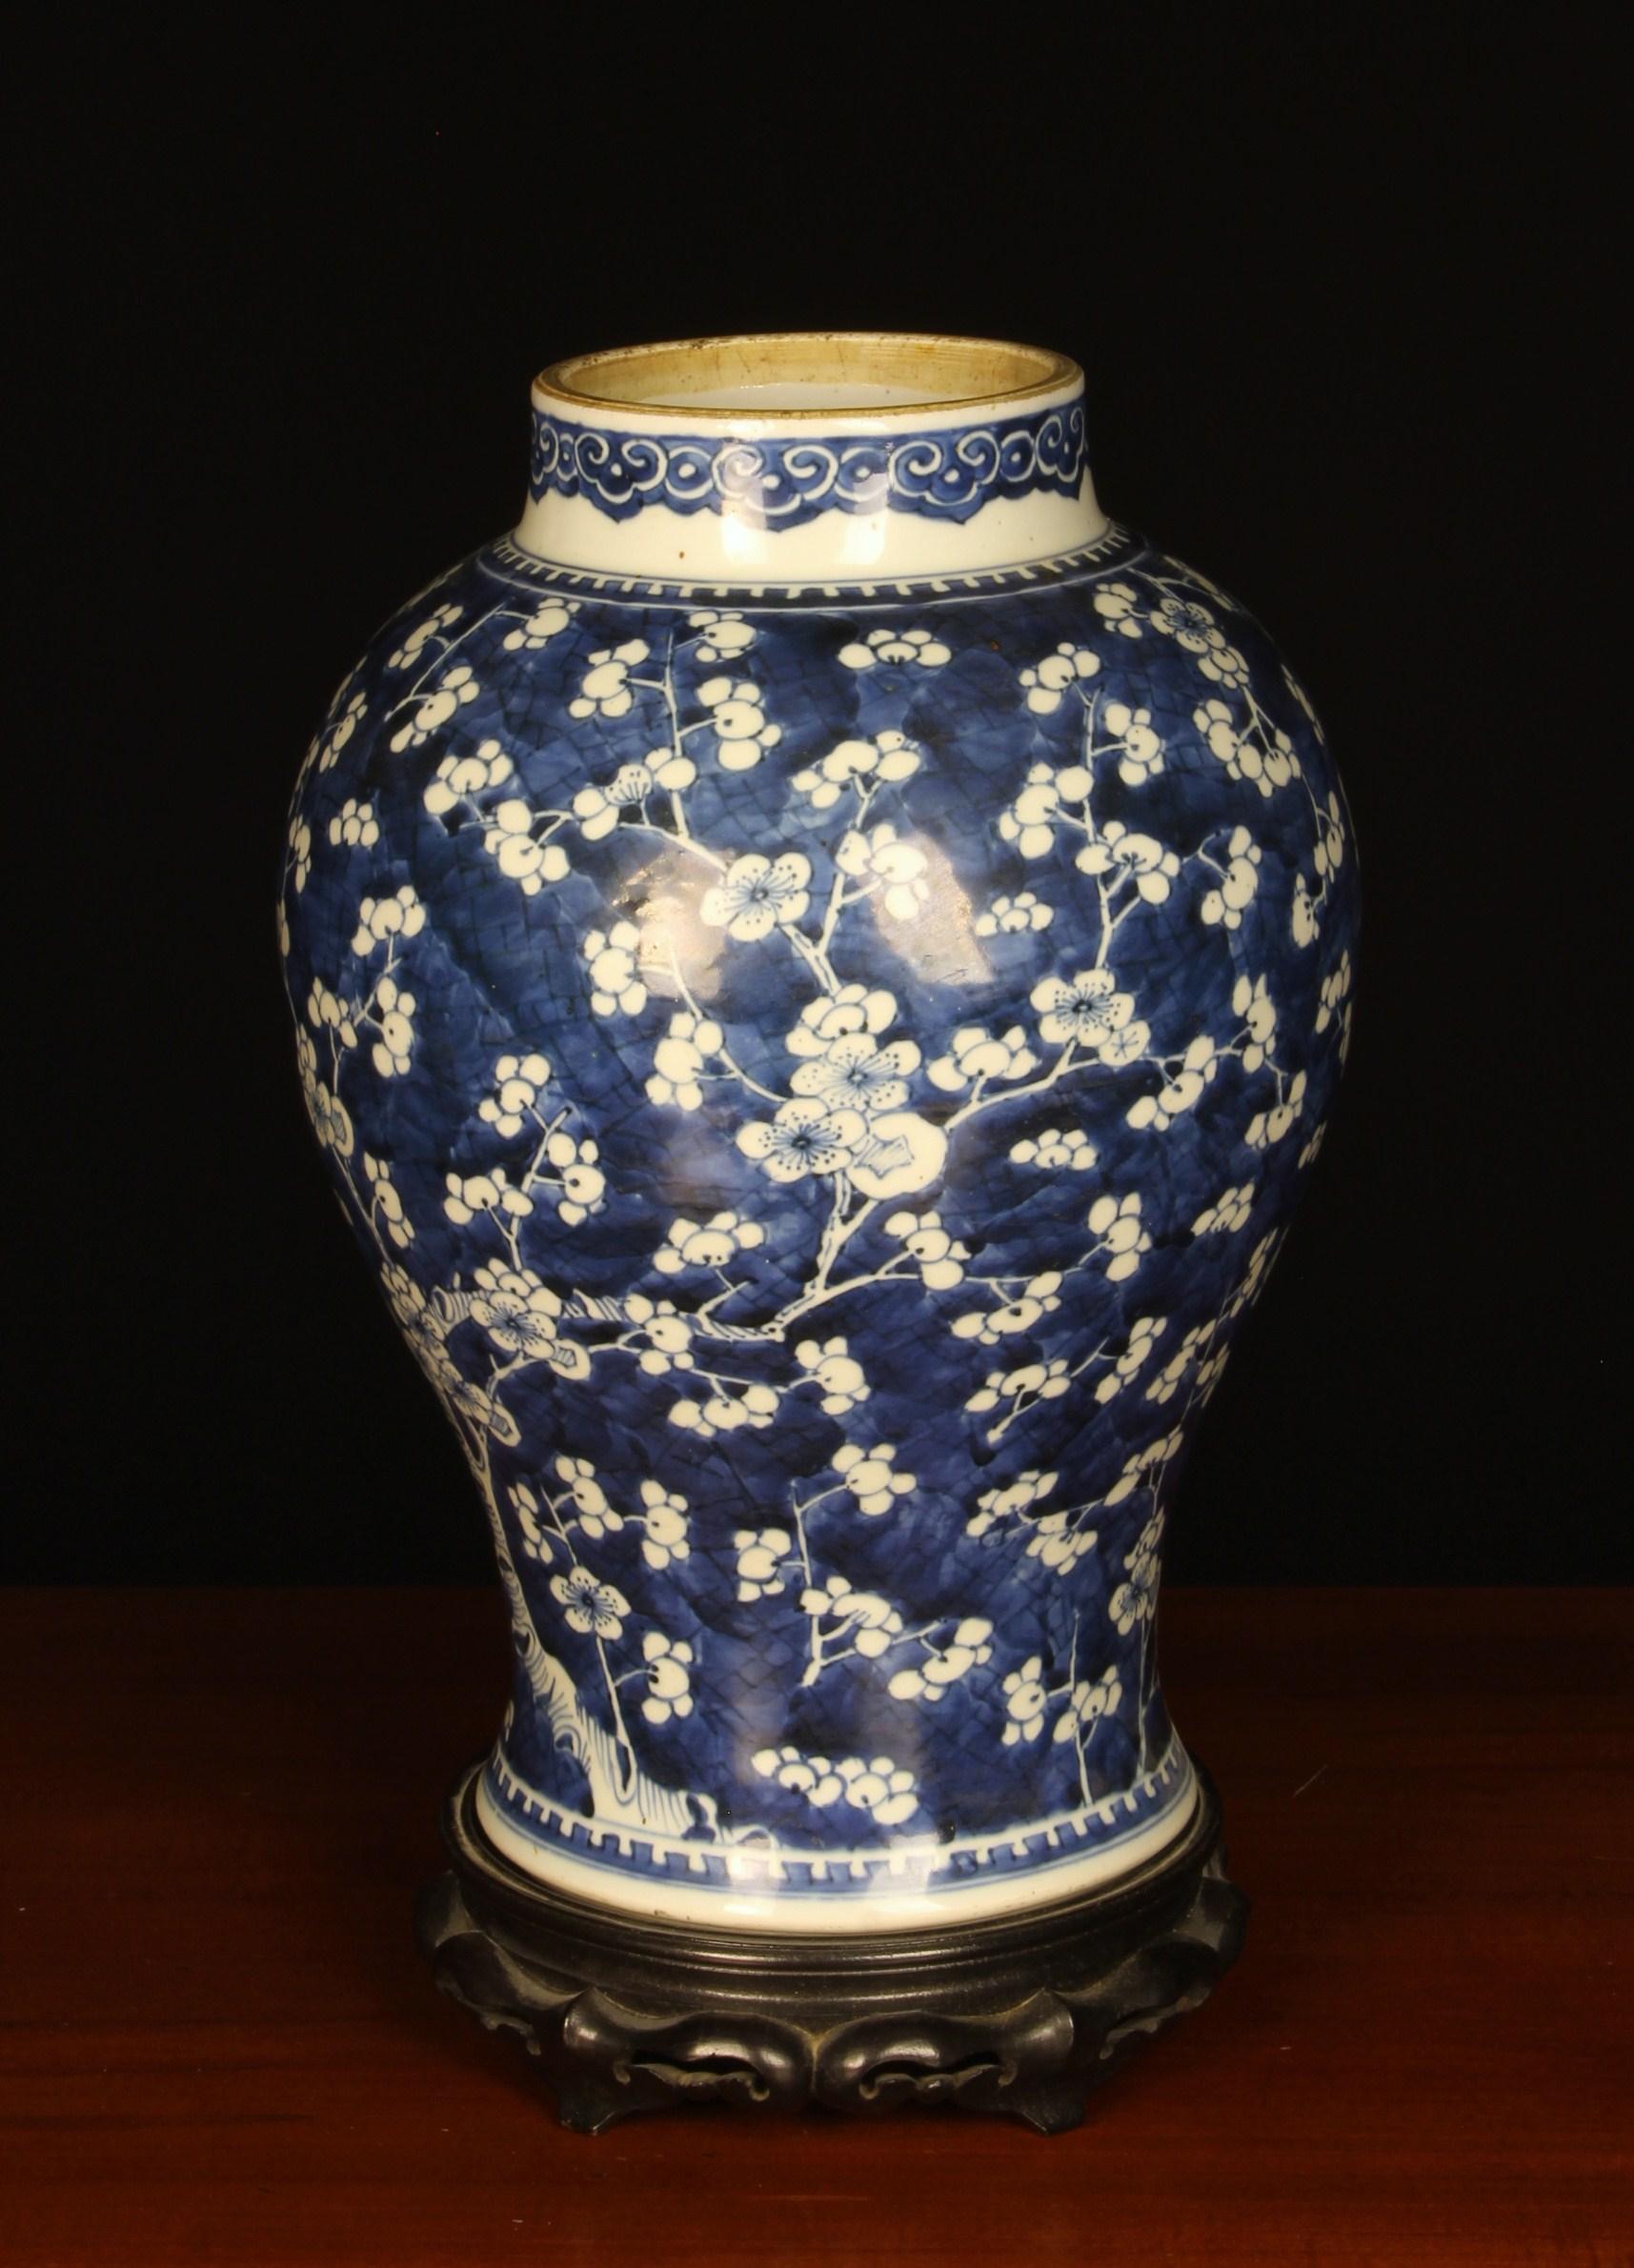 A Kangxi Blue & White Vase of rising baluster form.